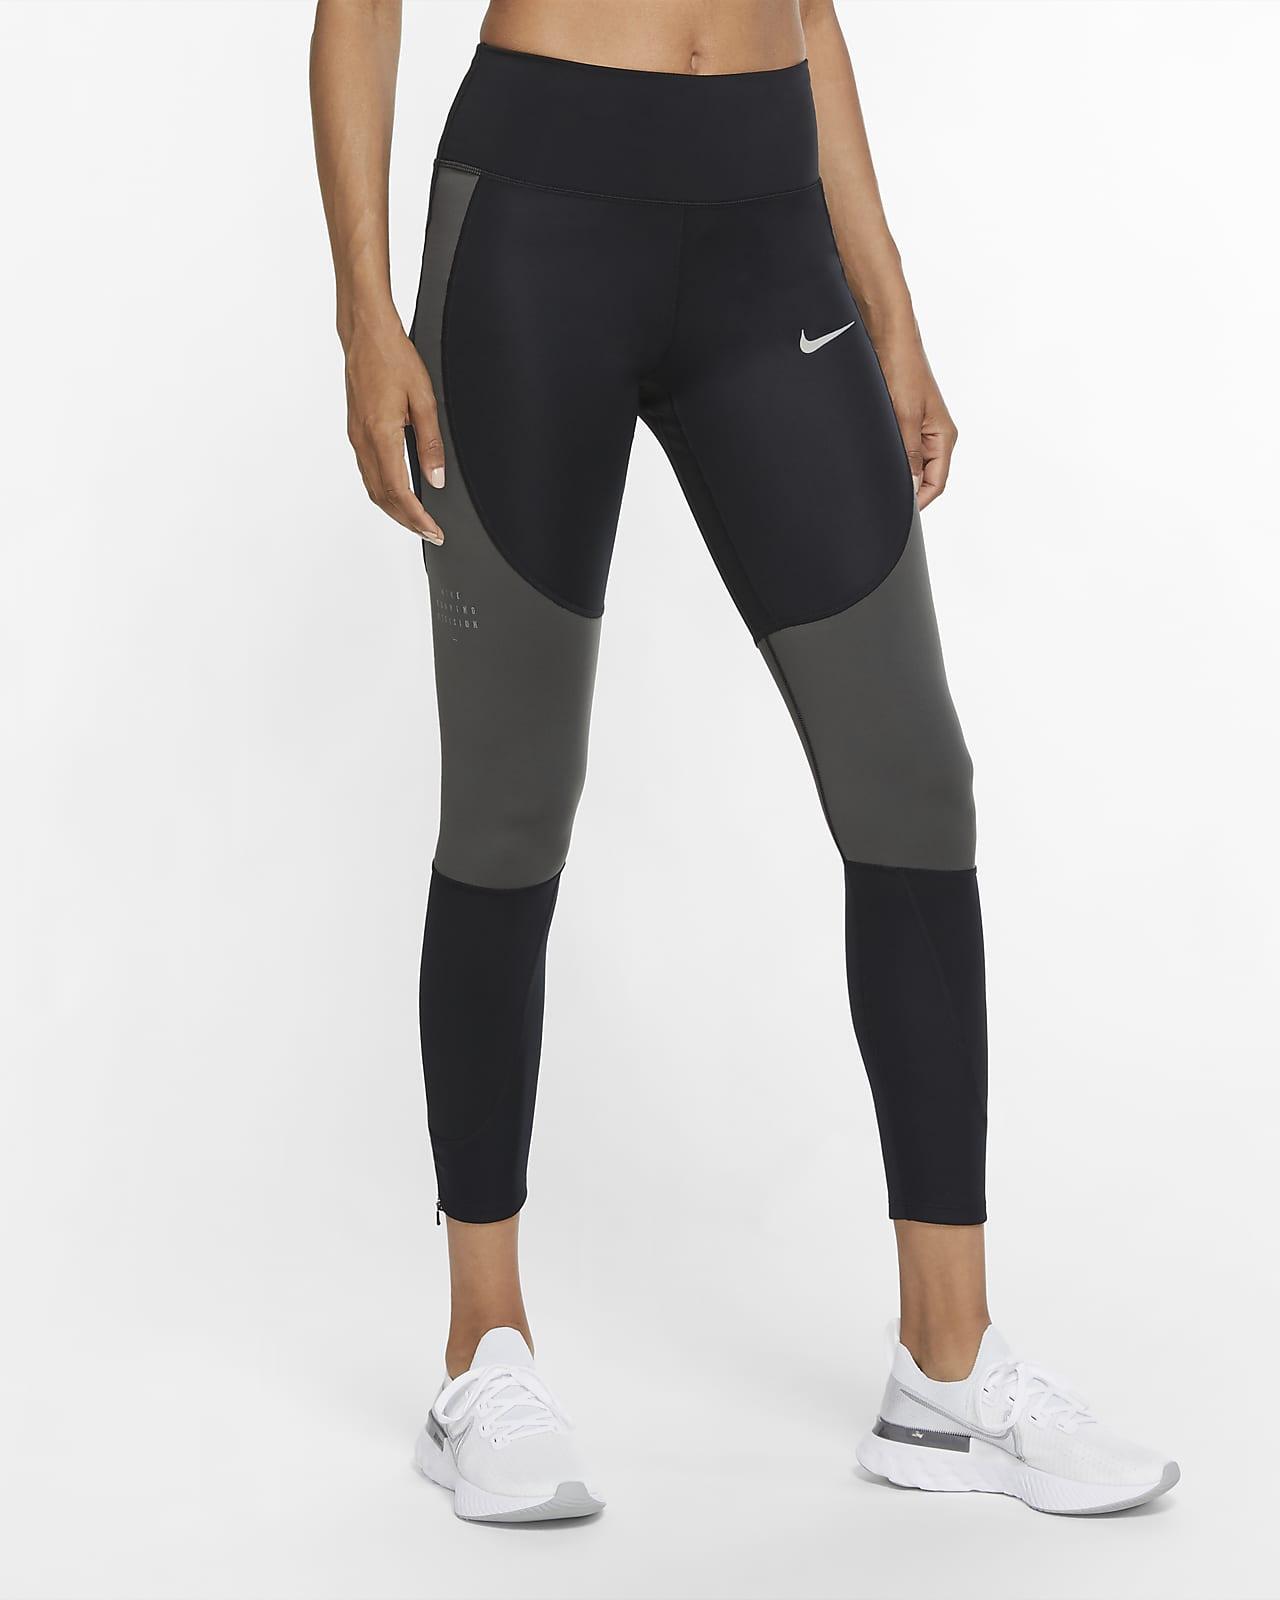 Legging de running Nike Epic Lux Run Division pour Femme